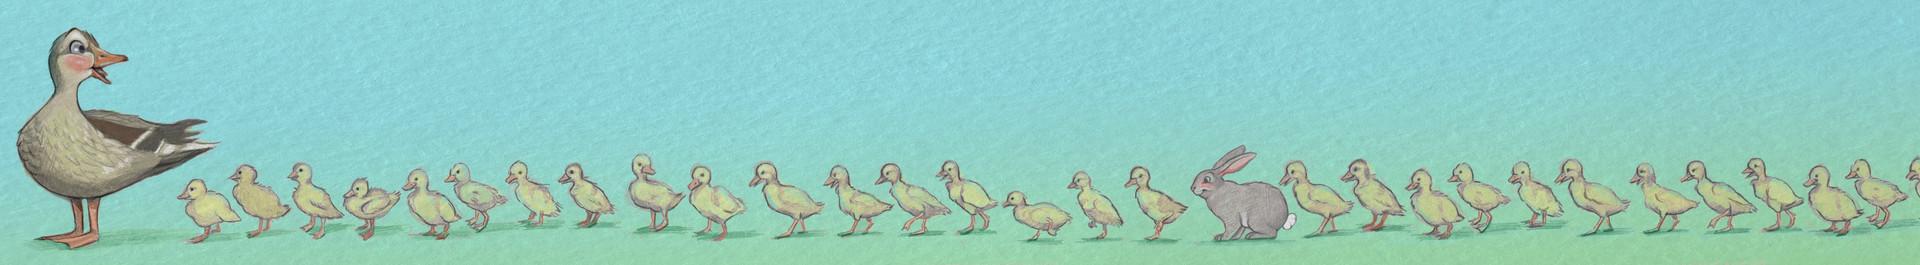 ducksnowords.jpg